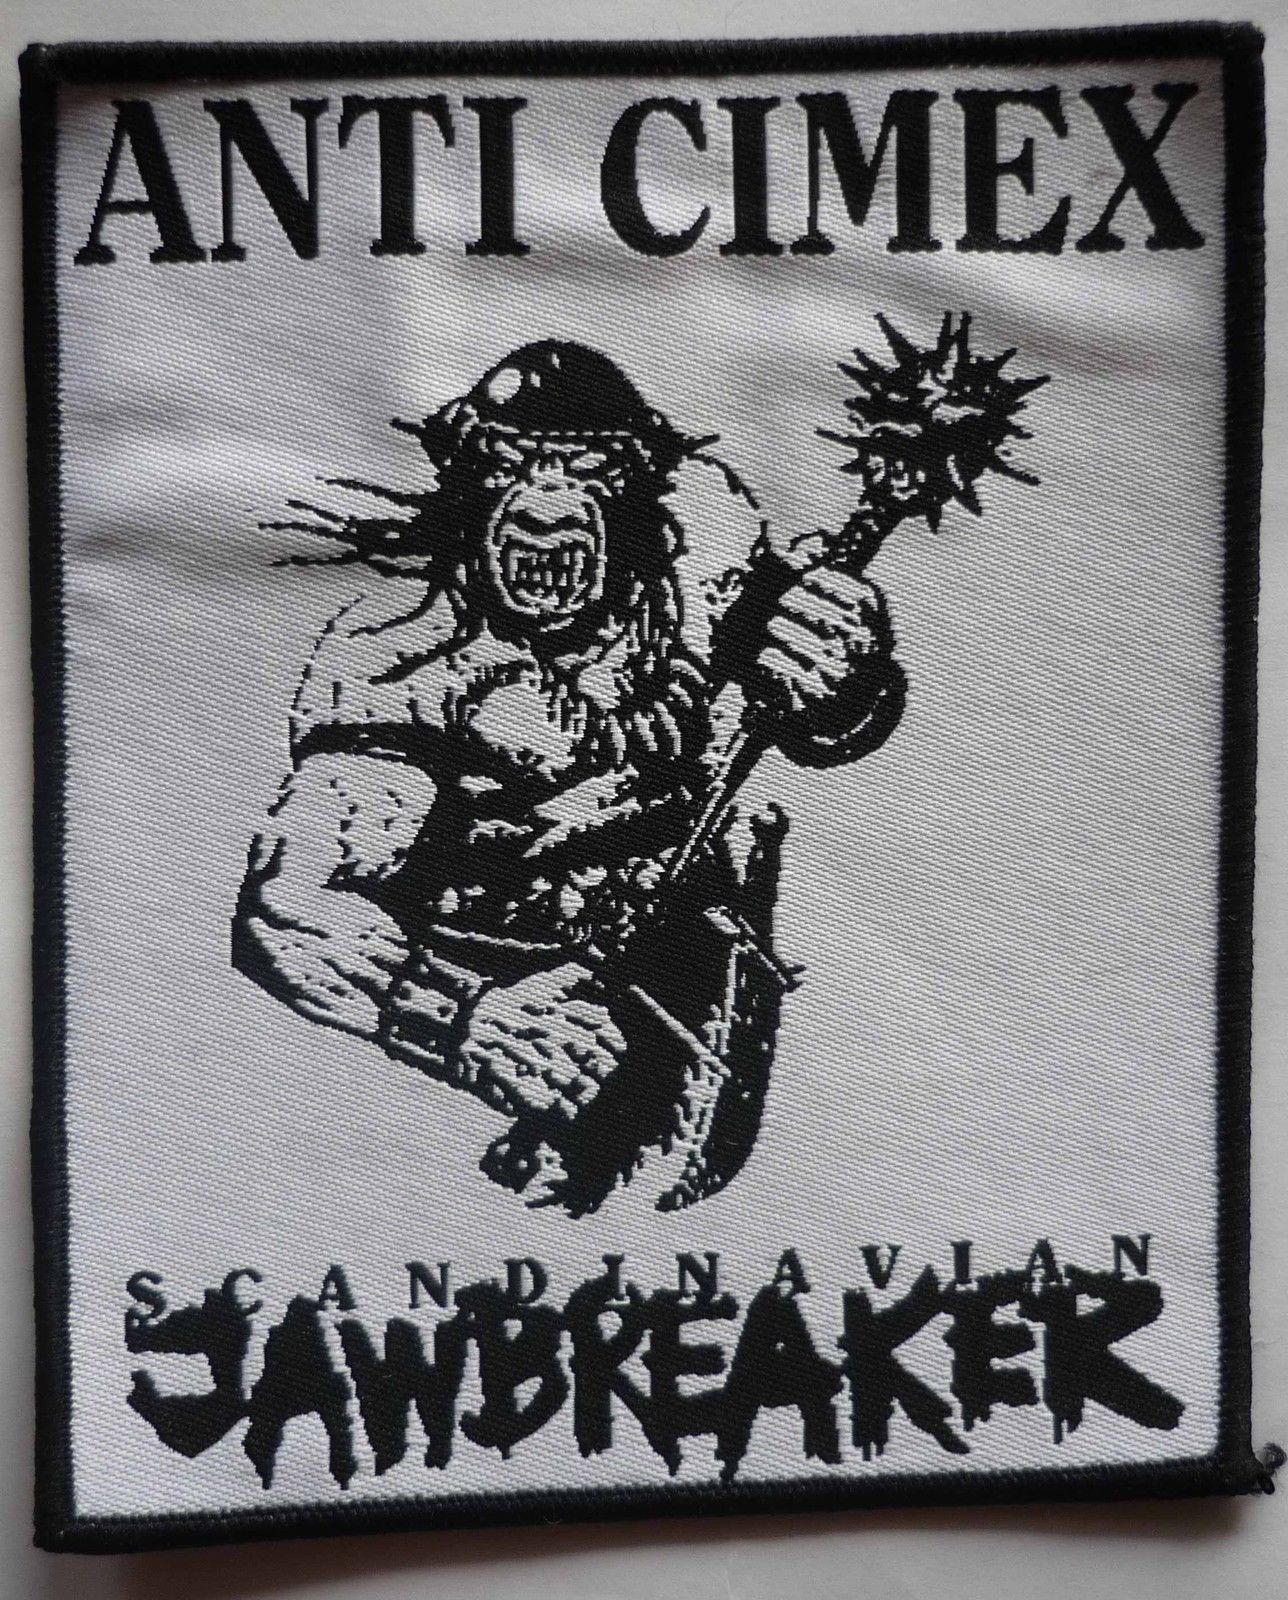 Anti Cimex Scandinavian Jawbreaker Woven Patch Black Seeds Records Merch Online Store Powered By Storenvy